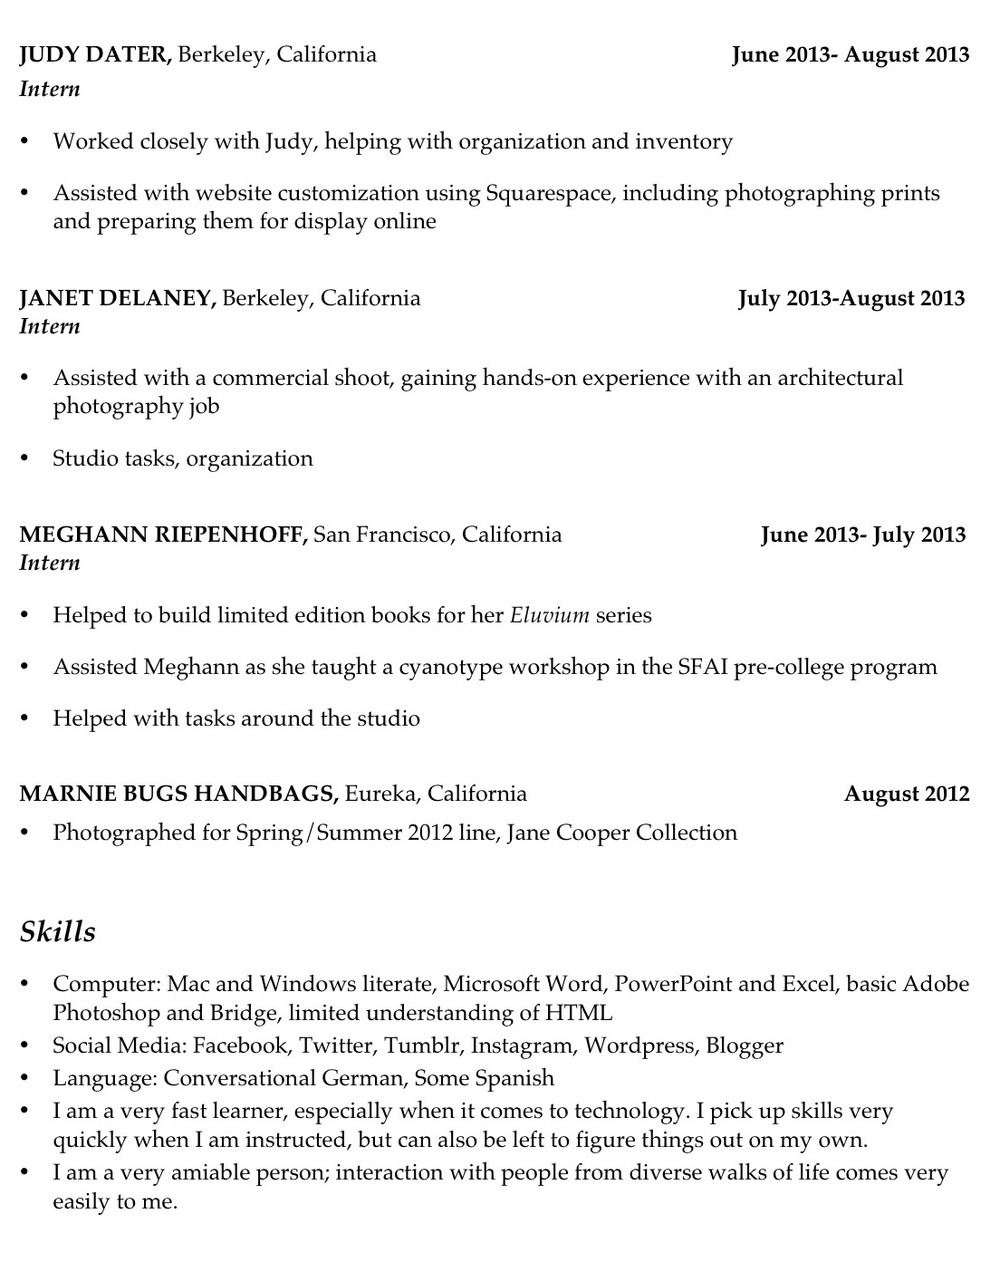 Web resume page 2.jpg